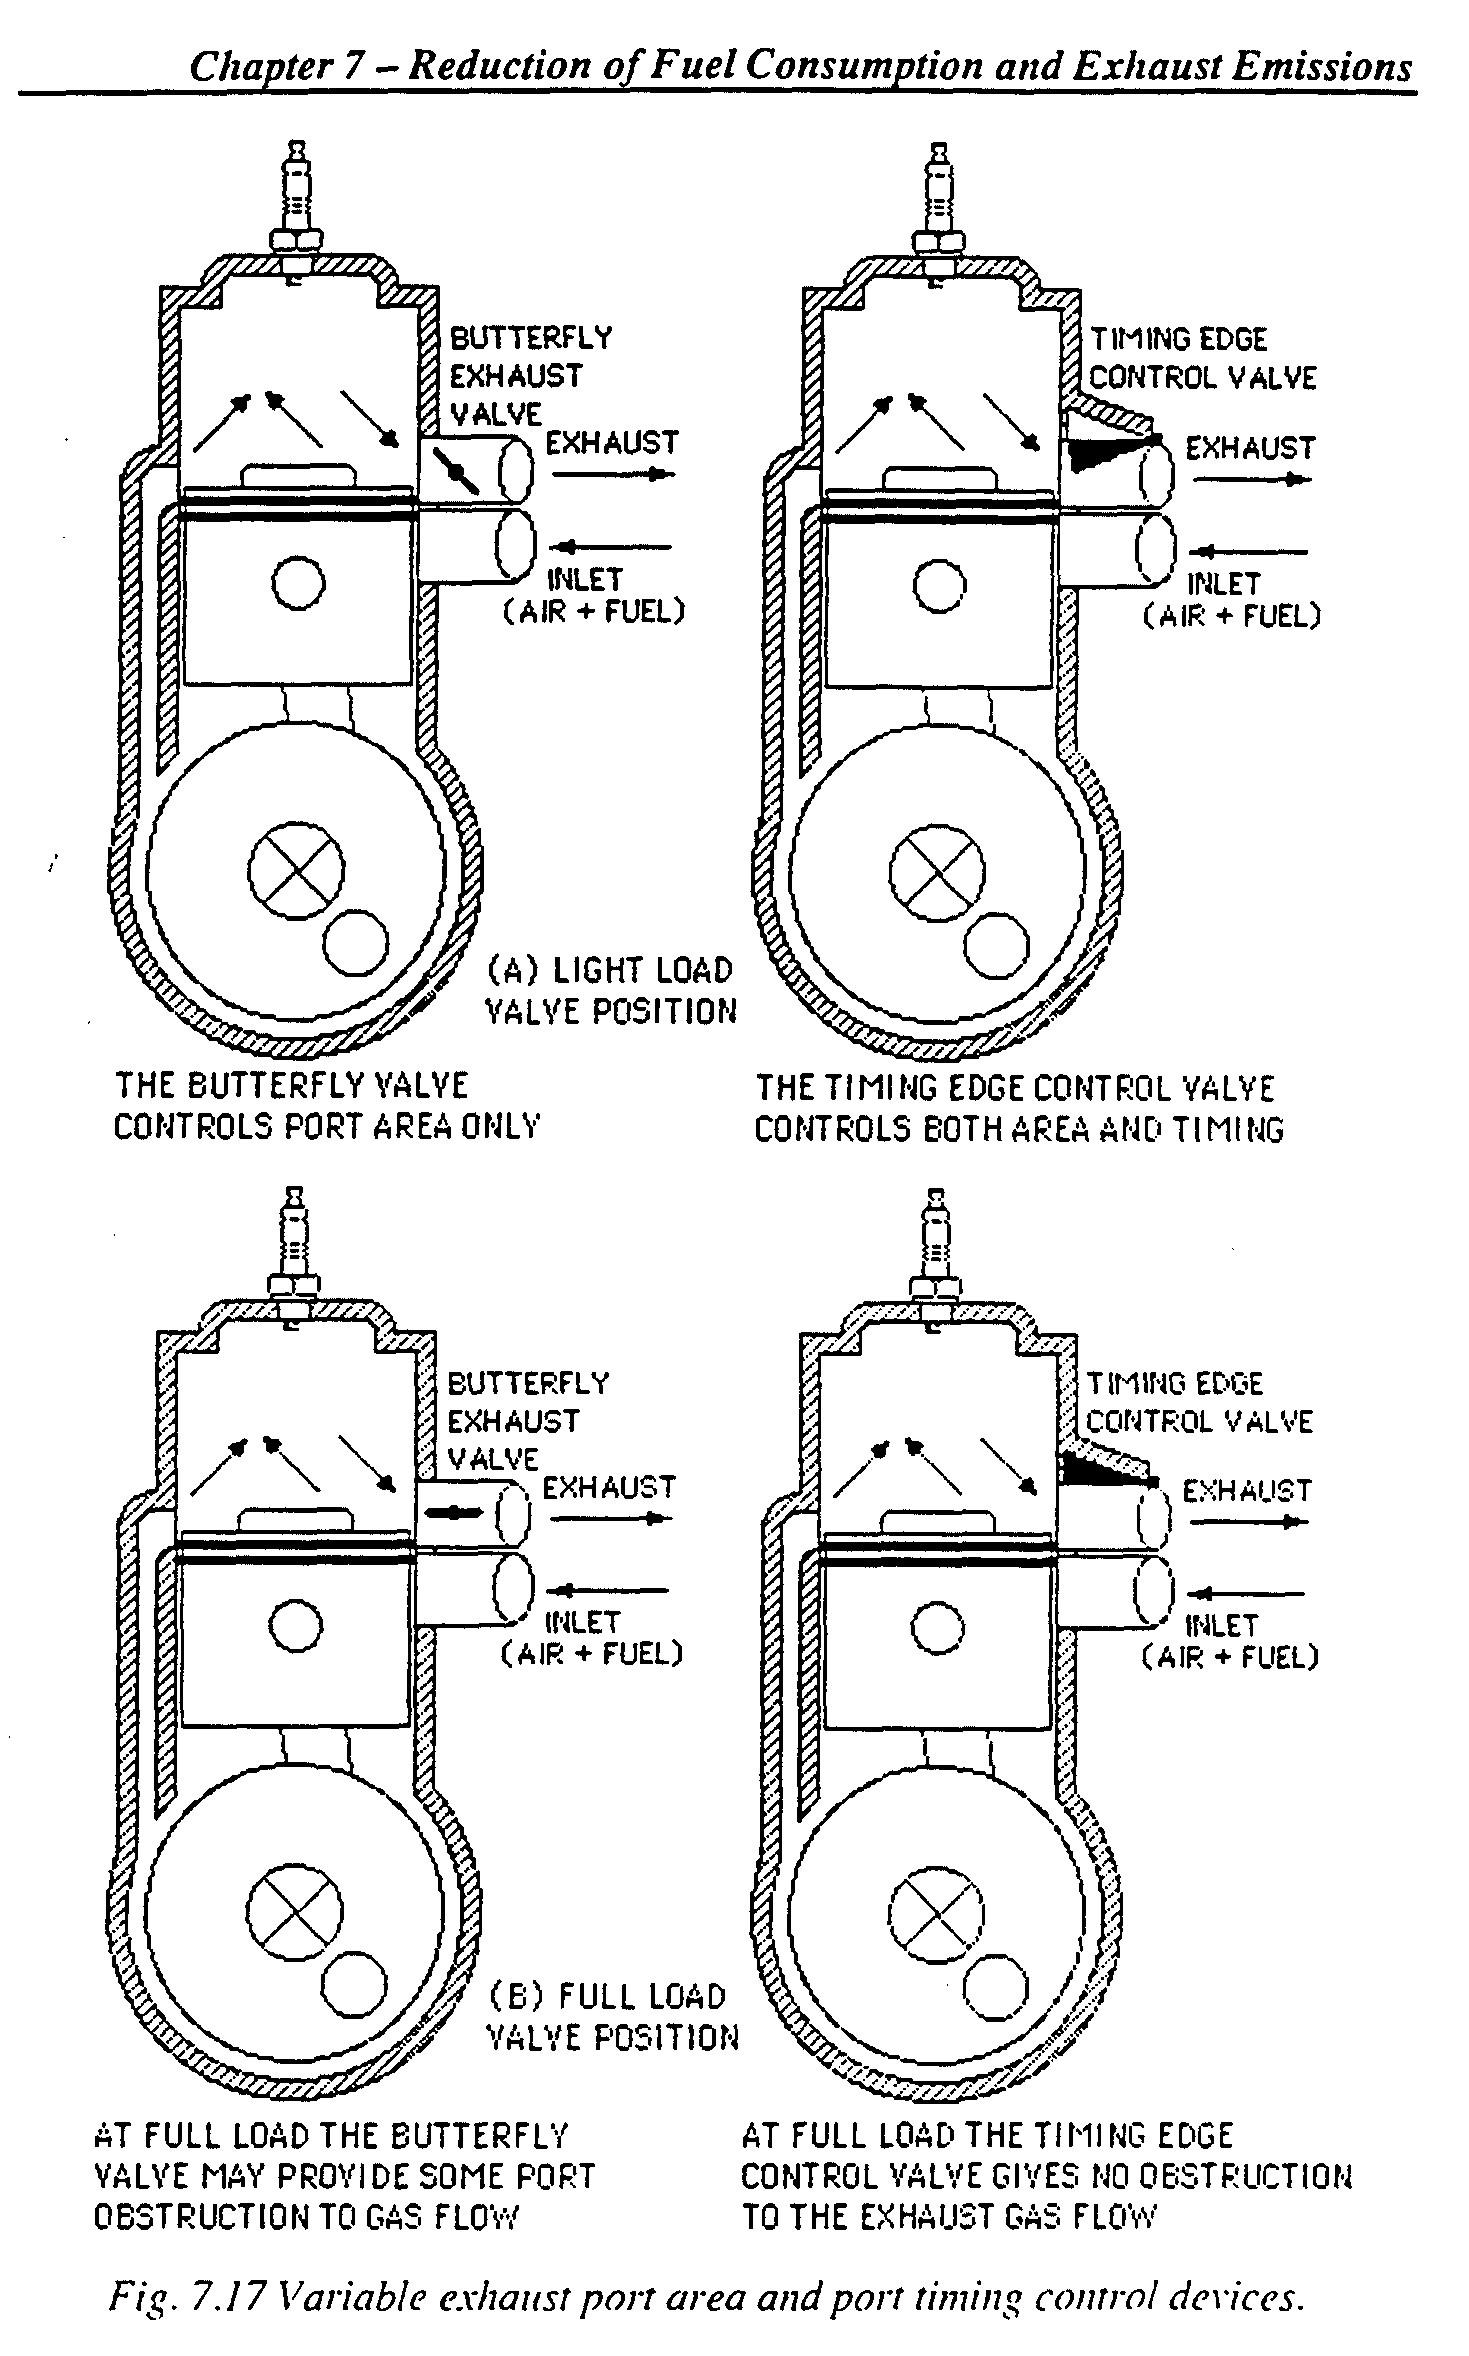 Valve Timing Diagram Of 4 Stroke Petrol Engine Energies